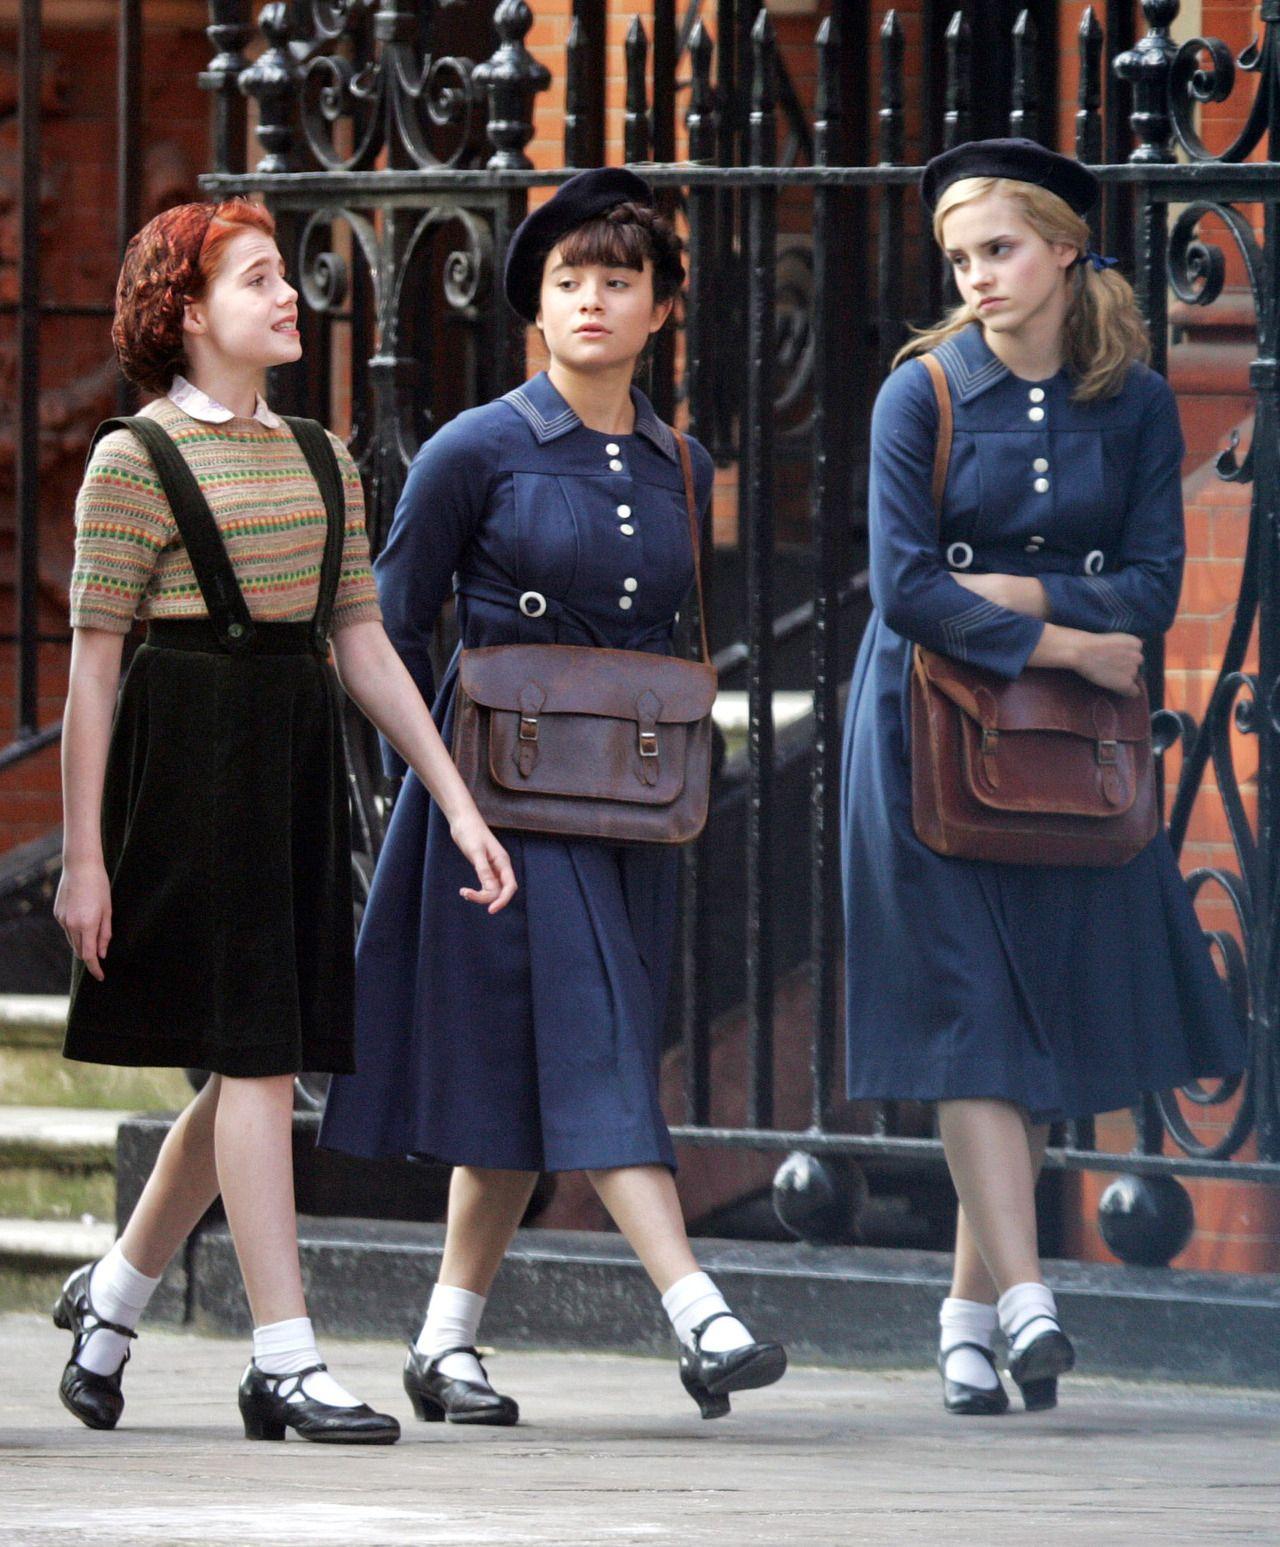 The Film Ballet Shoes Vintage Fashion In Film Tv